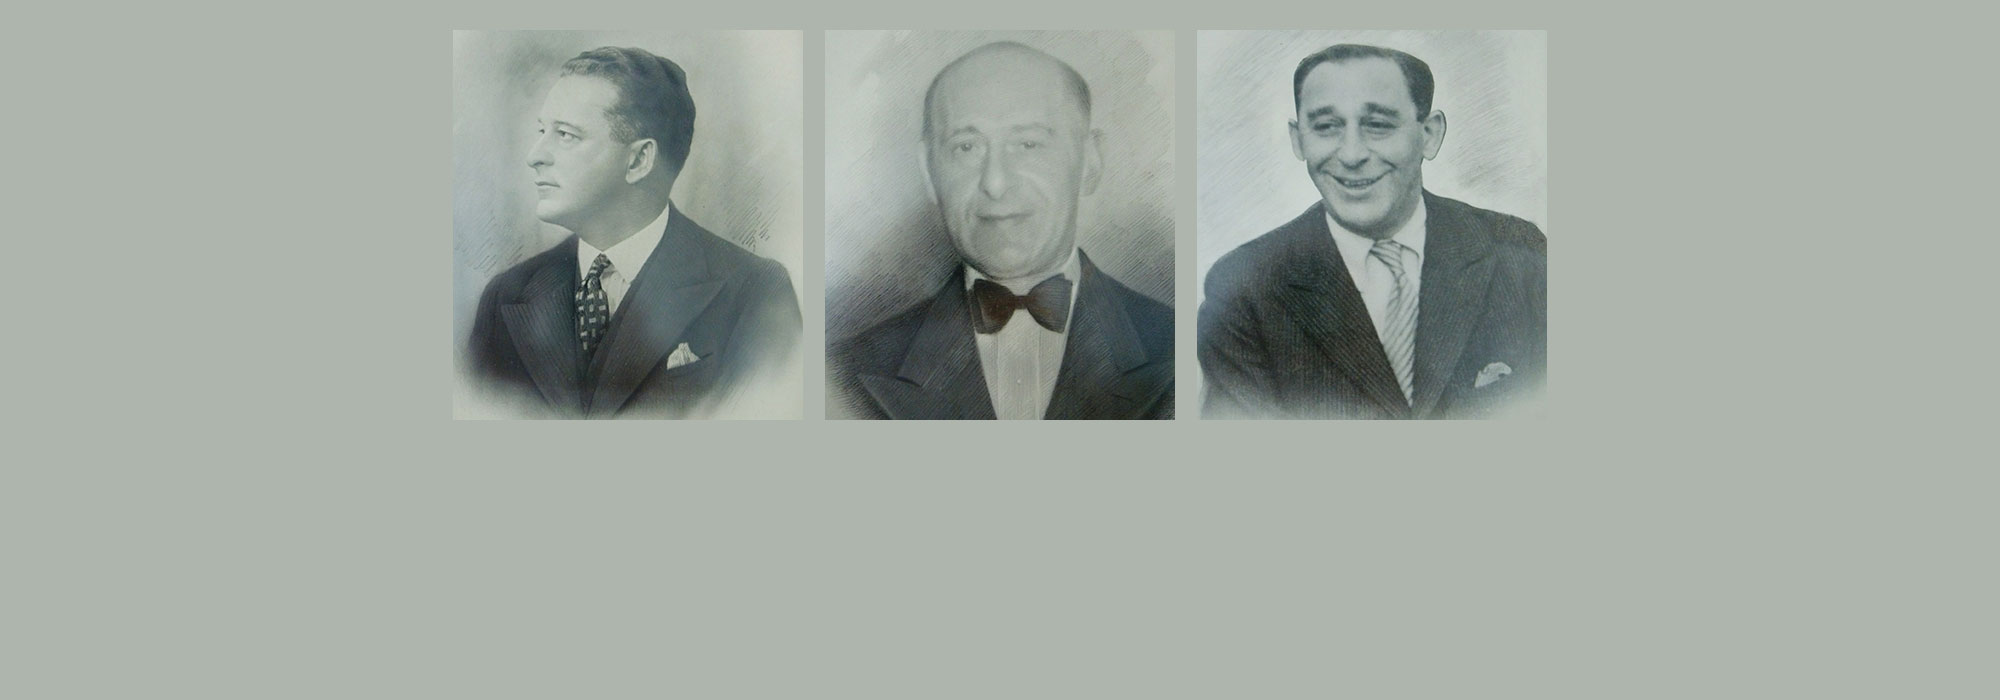 Isaac, Harry and Maurice Adlestone